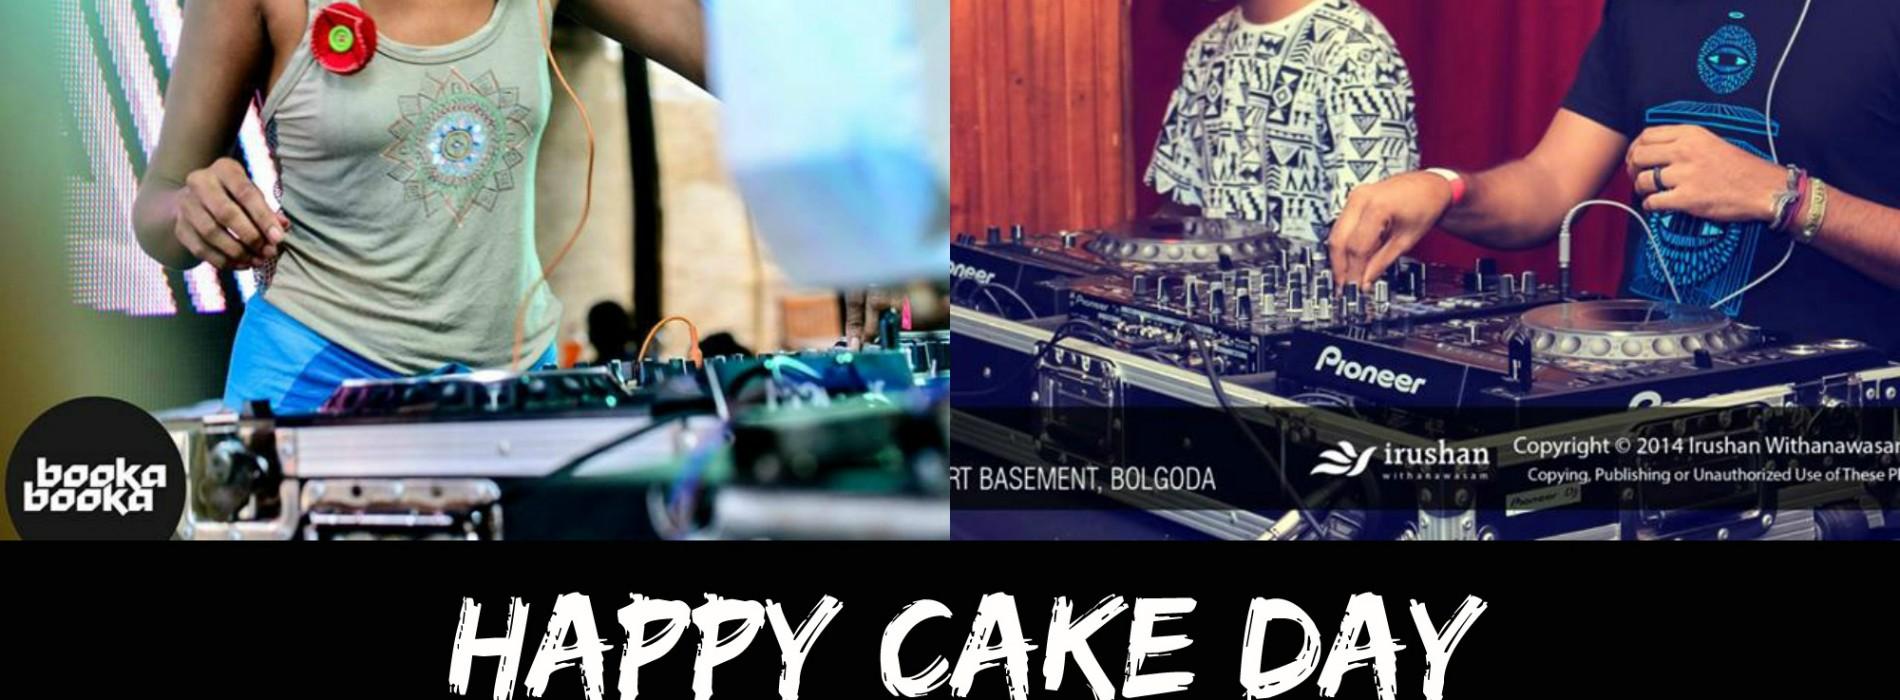 Happy Cake Day To Sunara & Nizl